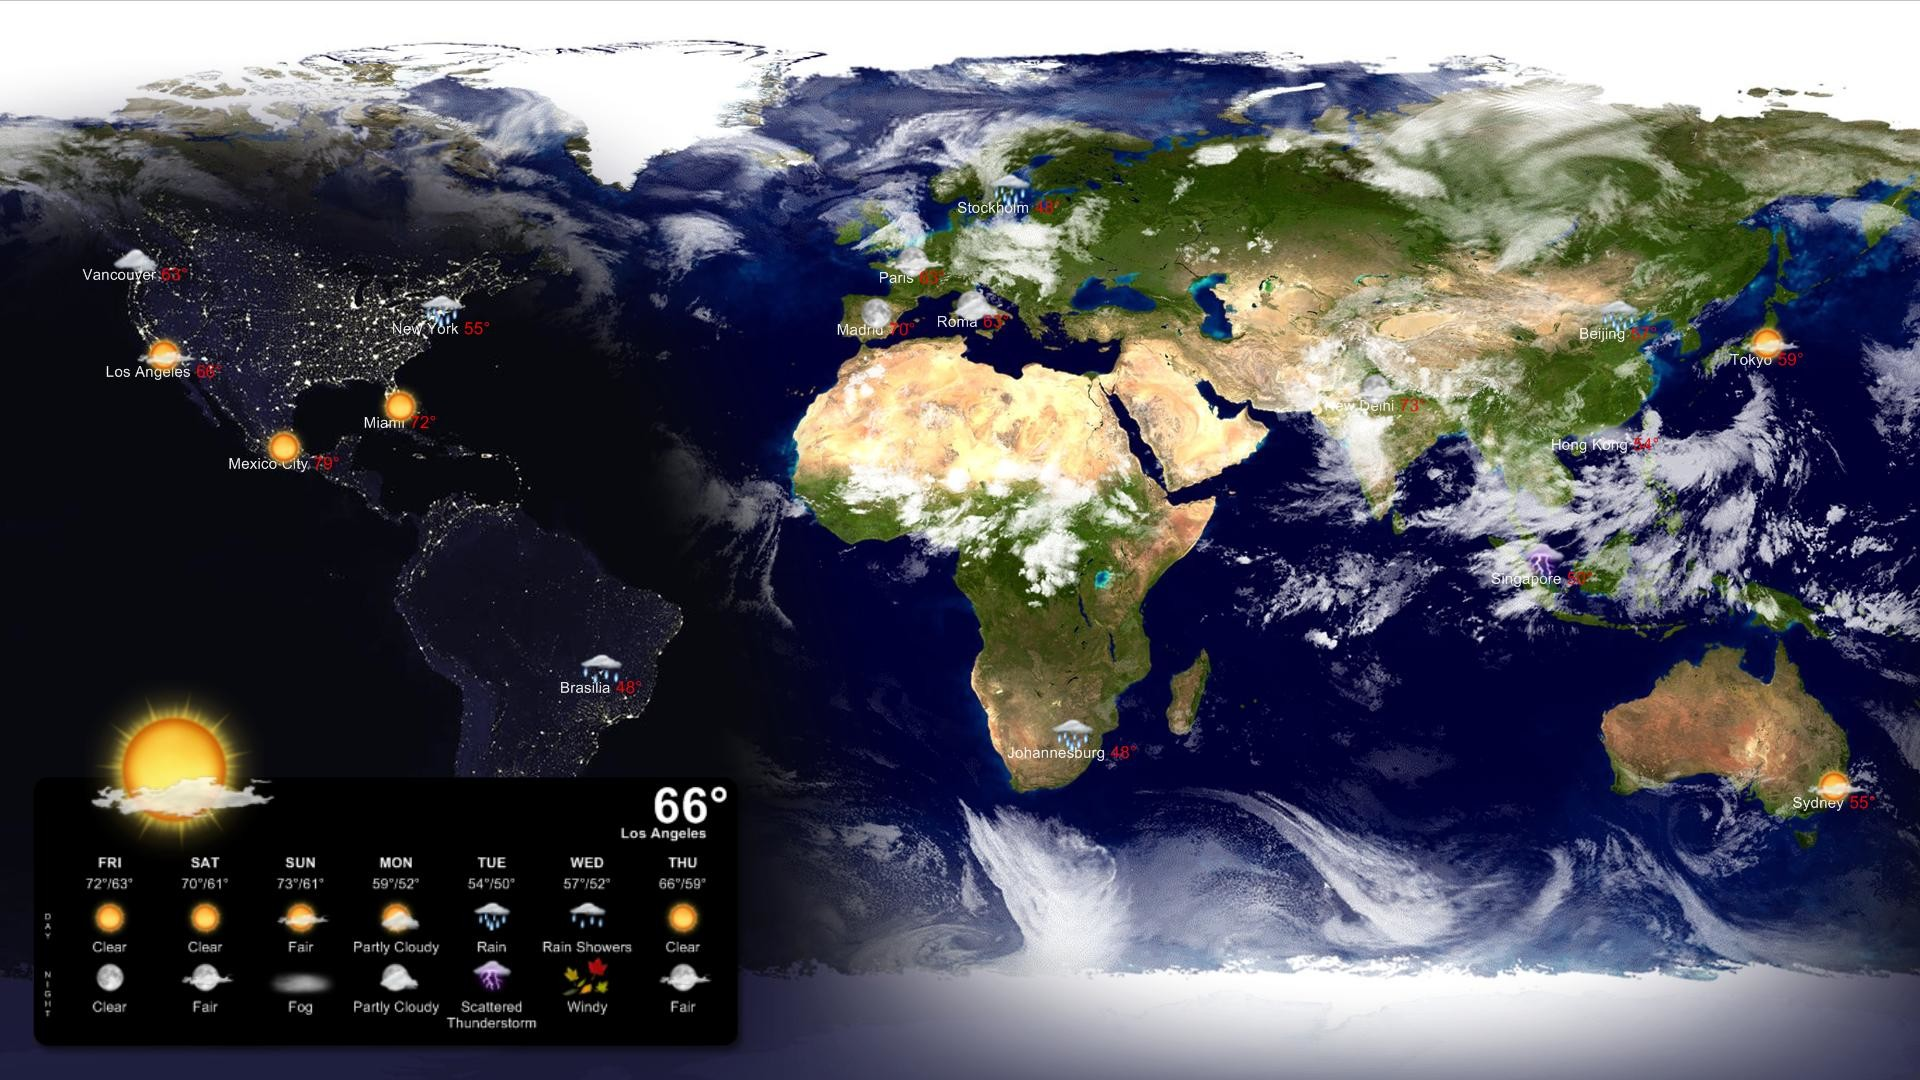 Download – Living Earth Desktop Wallpaper and Screen Saver